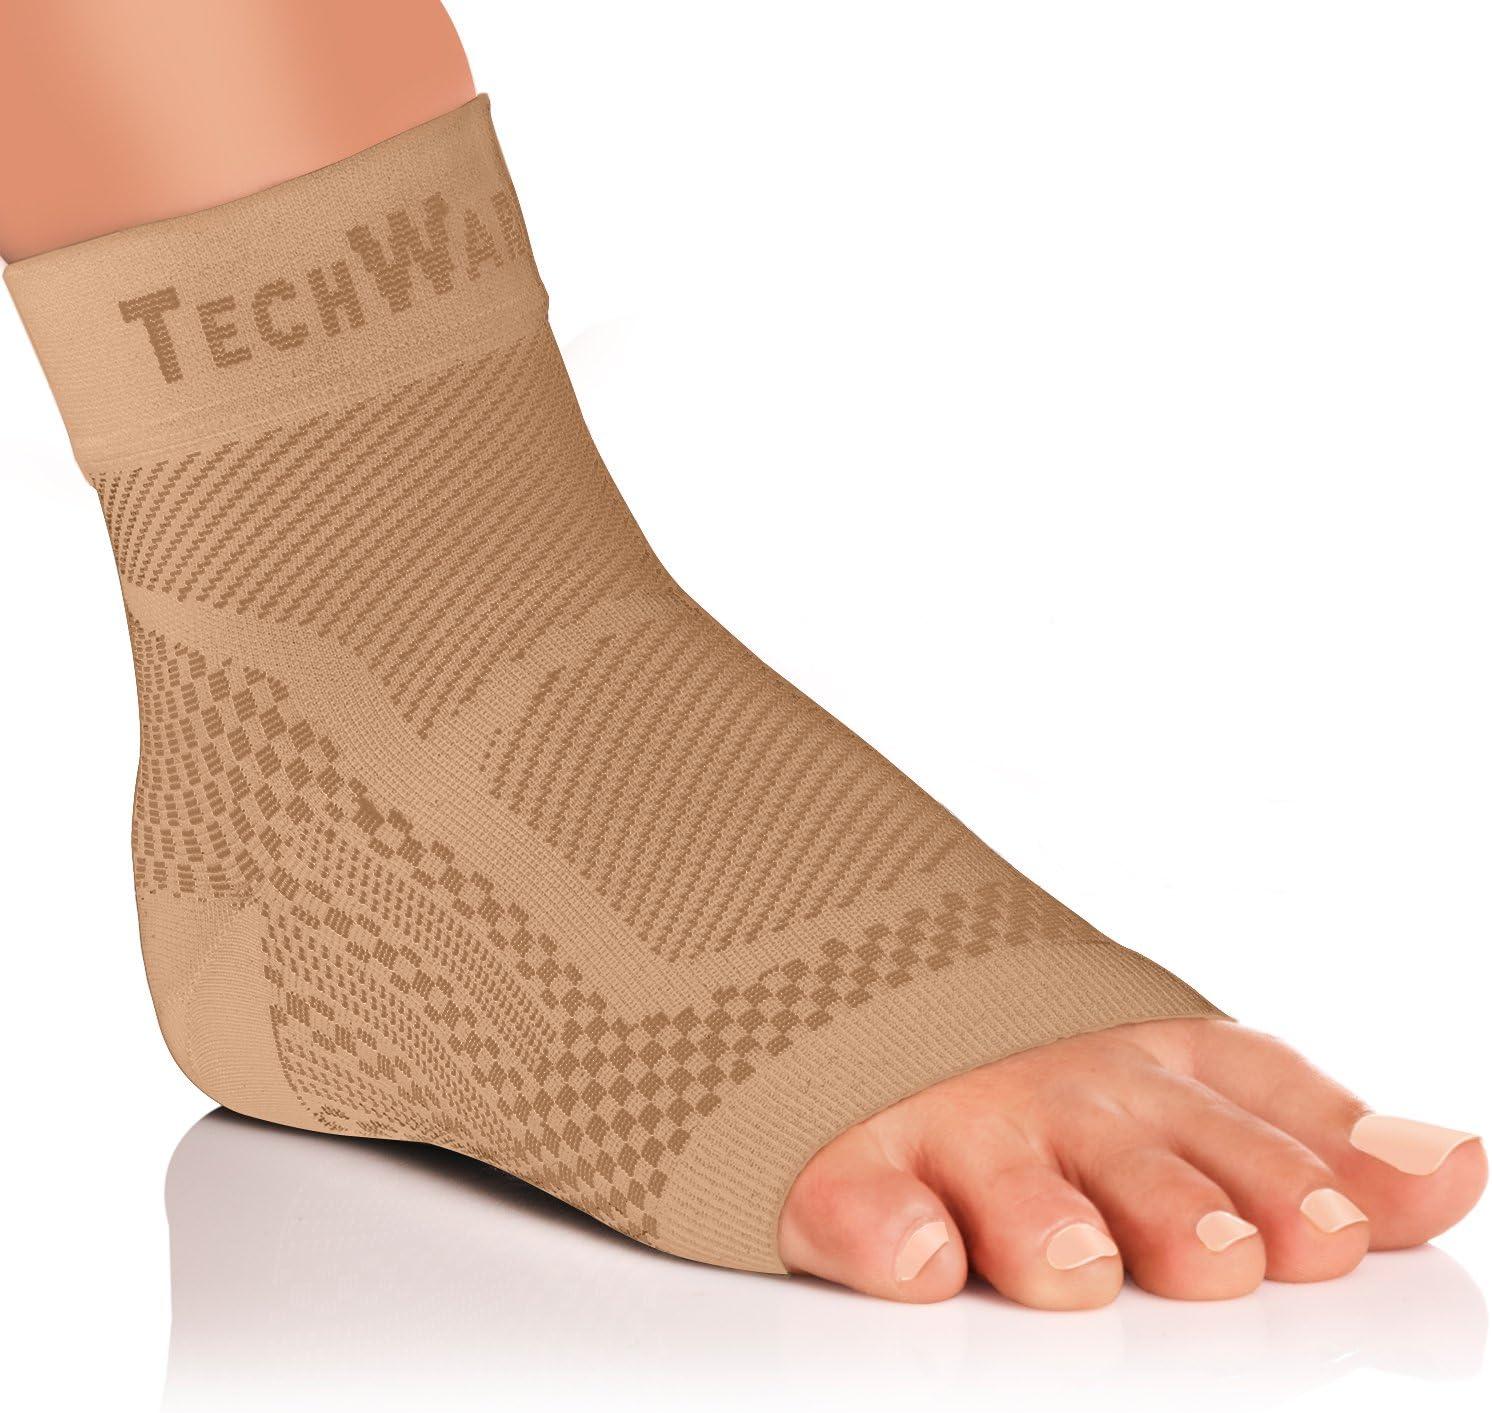 Teachware Pro Ankle Brace